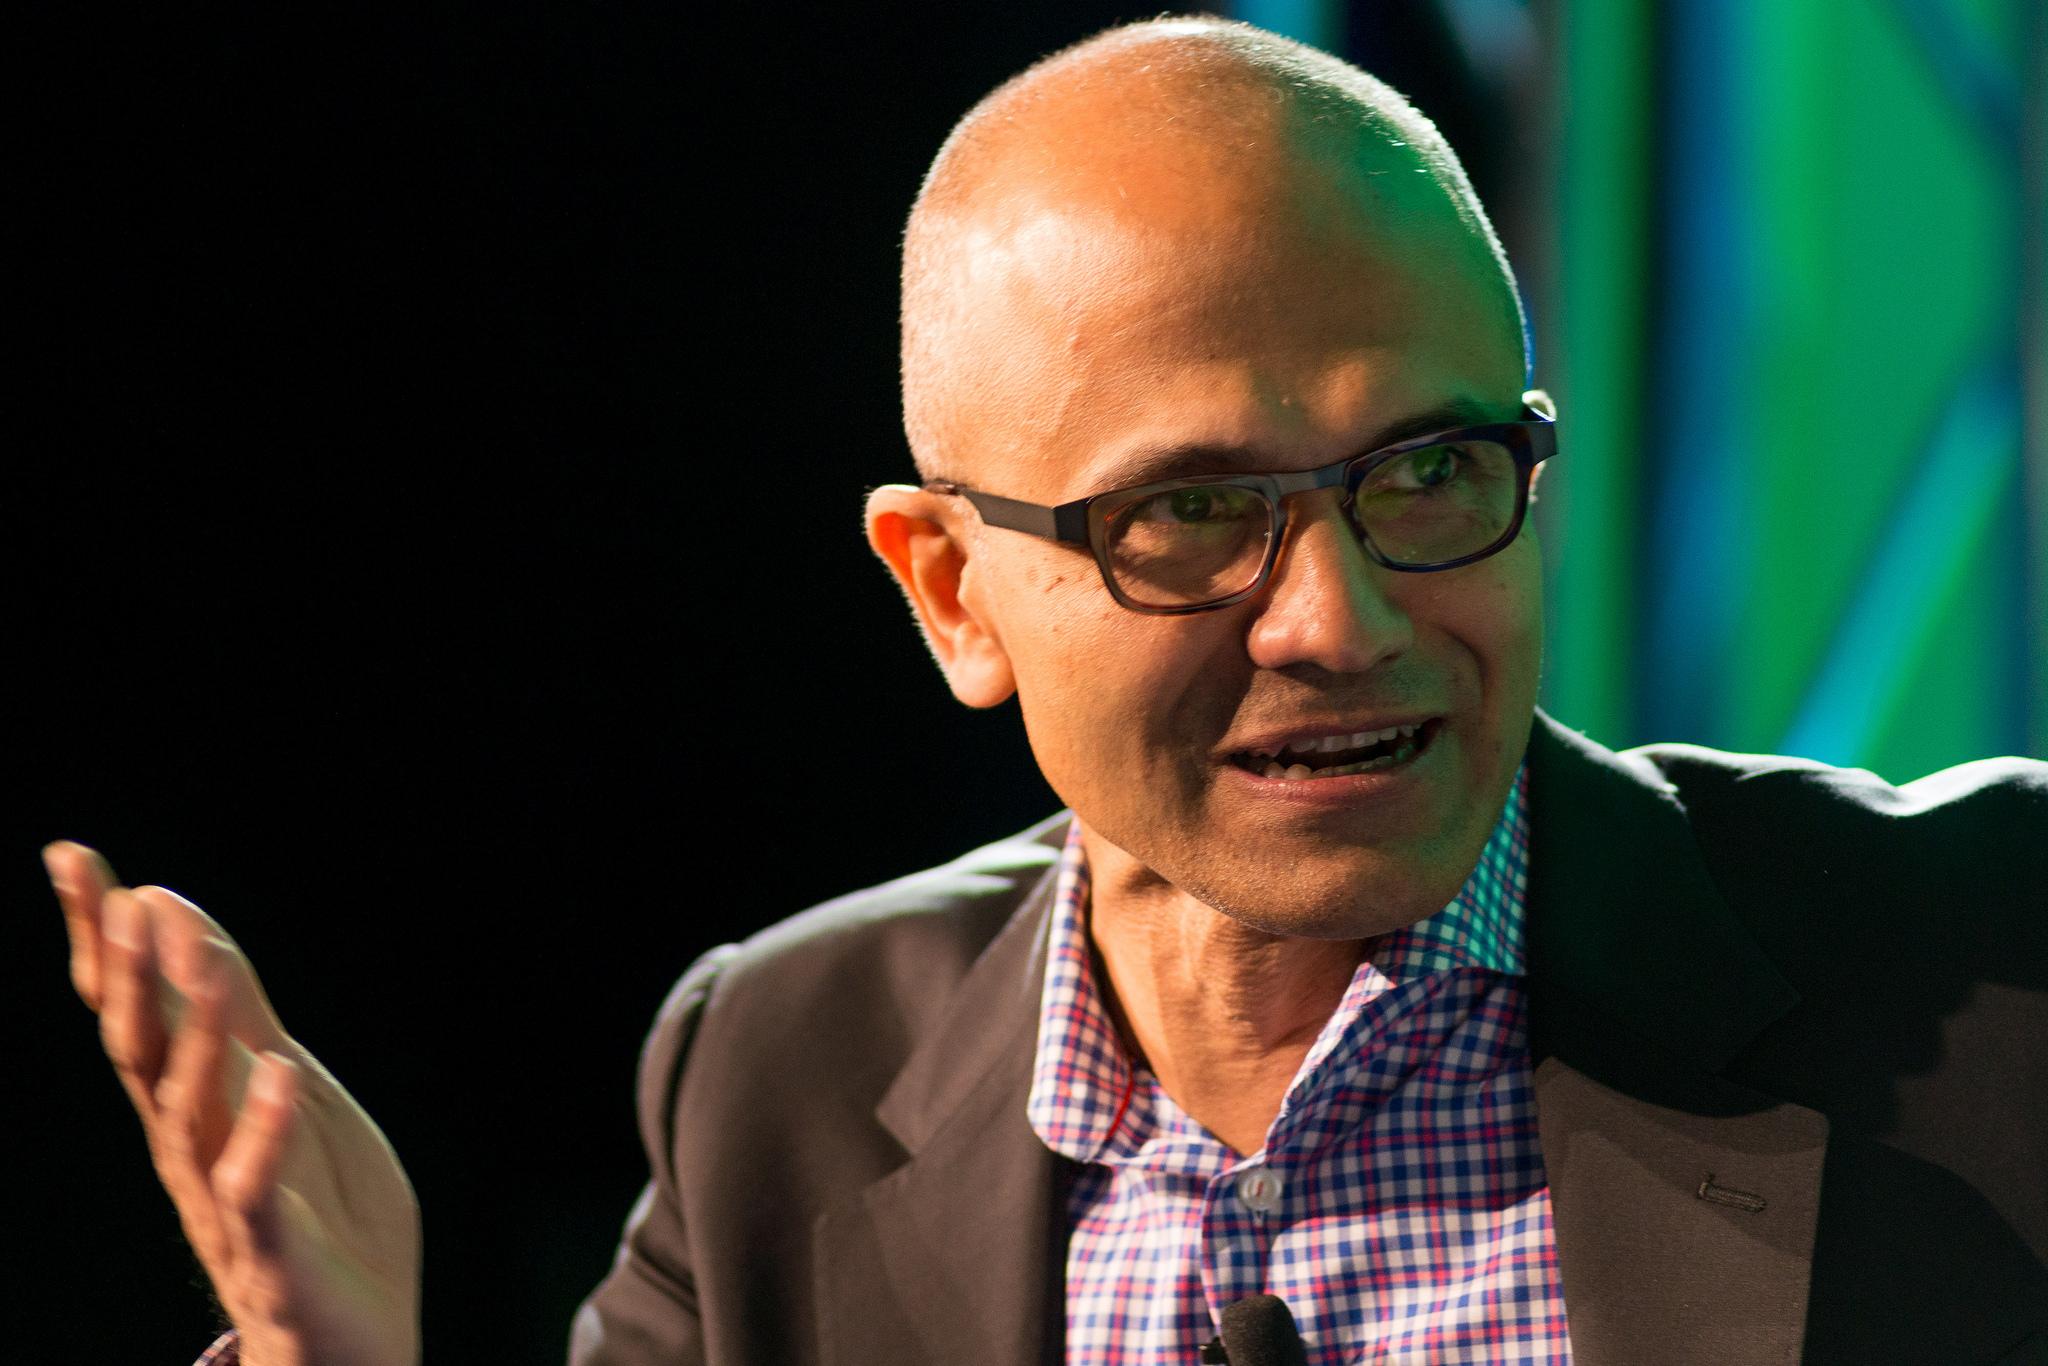 Microsoft CEO Satya Nadella speaks at Fortune Brainstorm Tech in Aspen, Colorado on July 14, 2014.